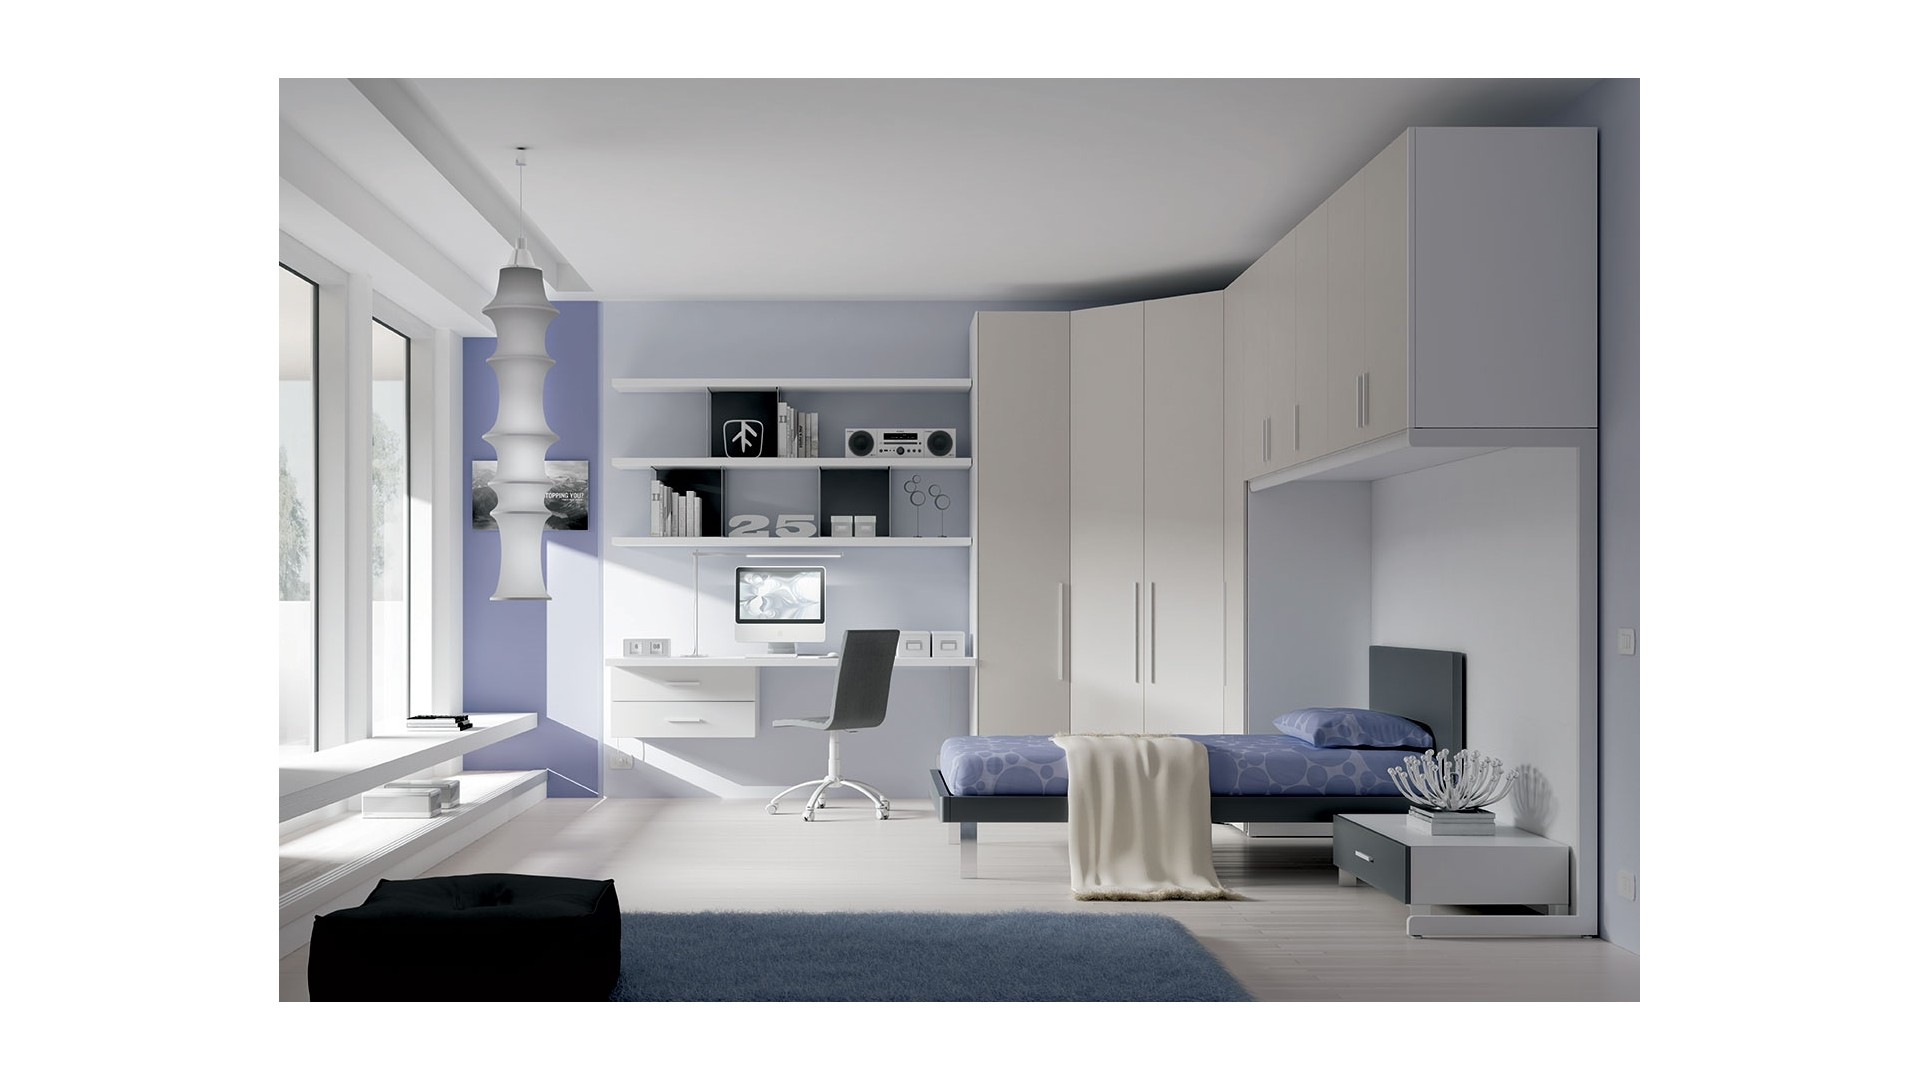 Chambre ado PERSONNALISABLE YC29 lit 1 personne - MORETTI COMPACT